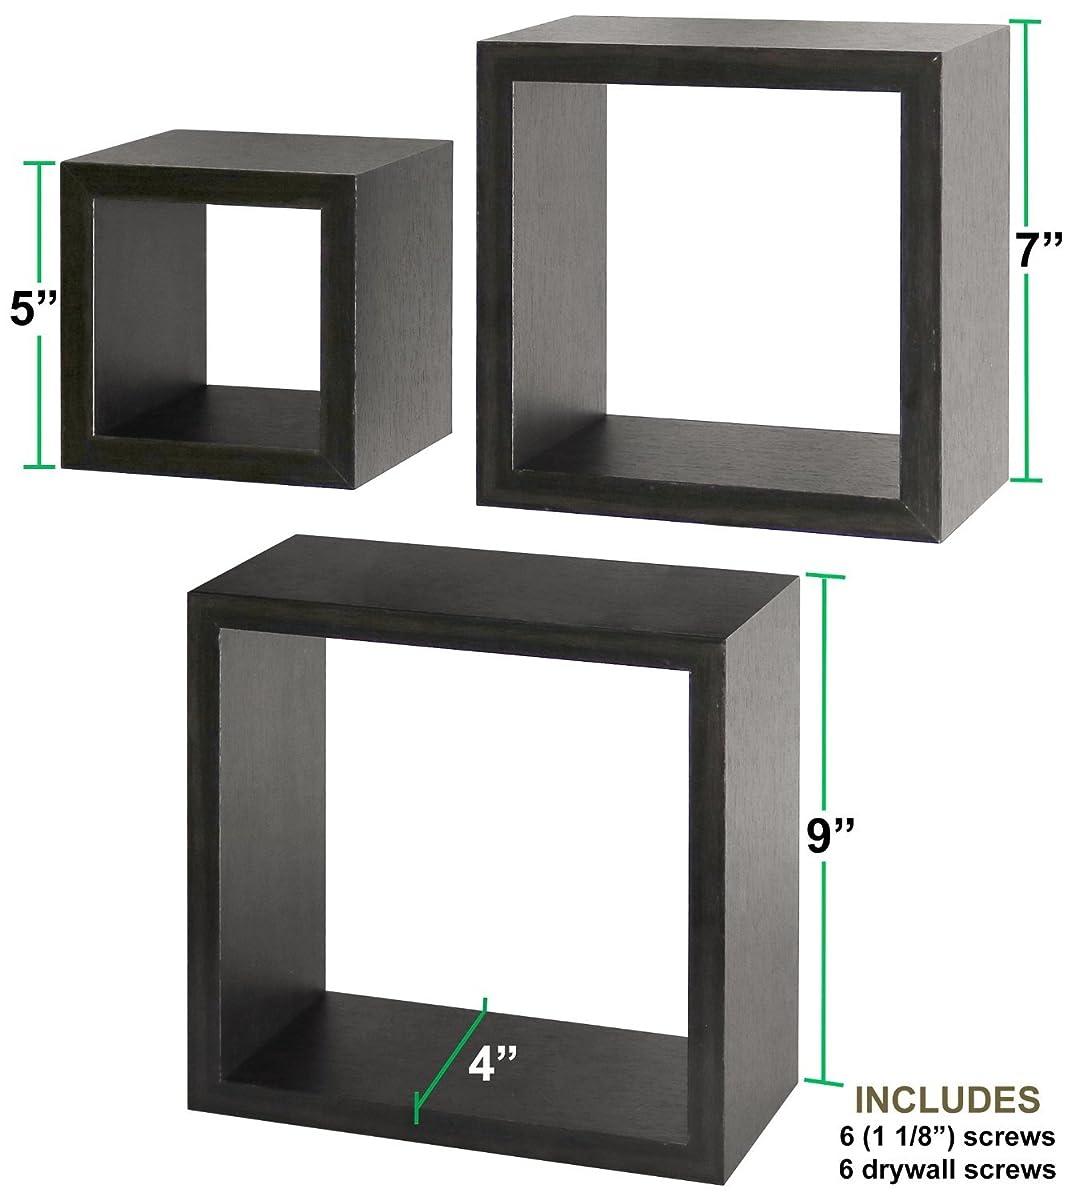 Greenco Set of 3 Floating Cube Shelves, Espresso Finish